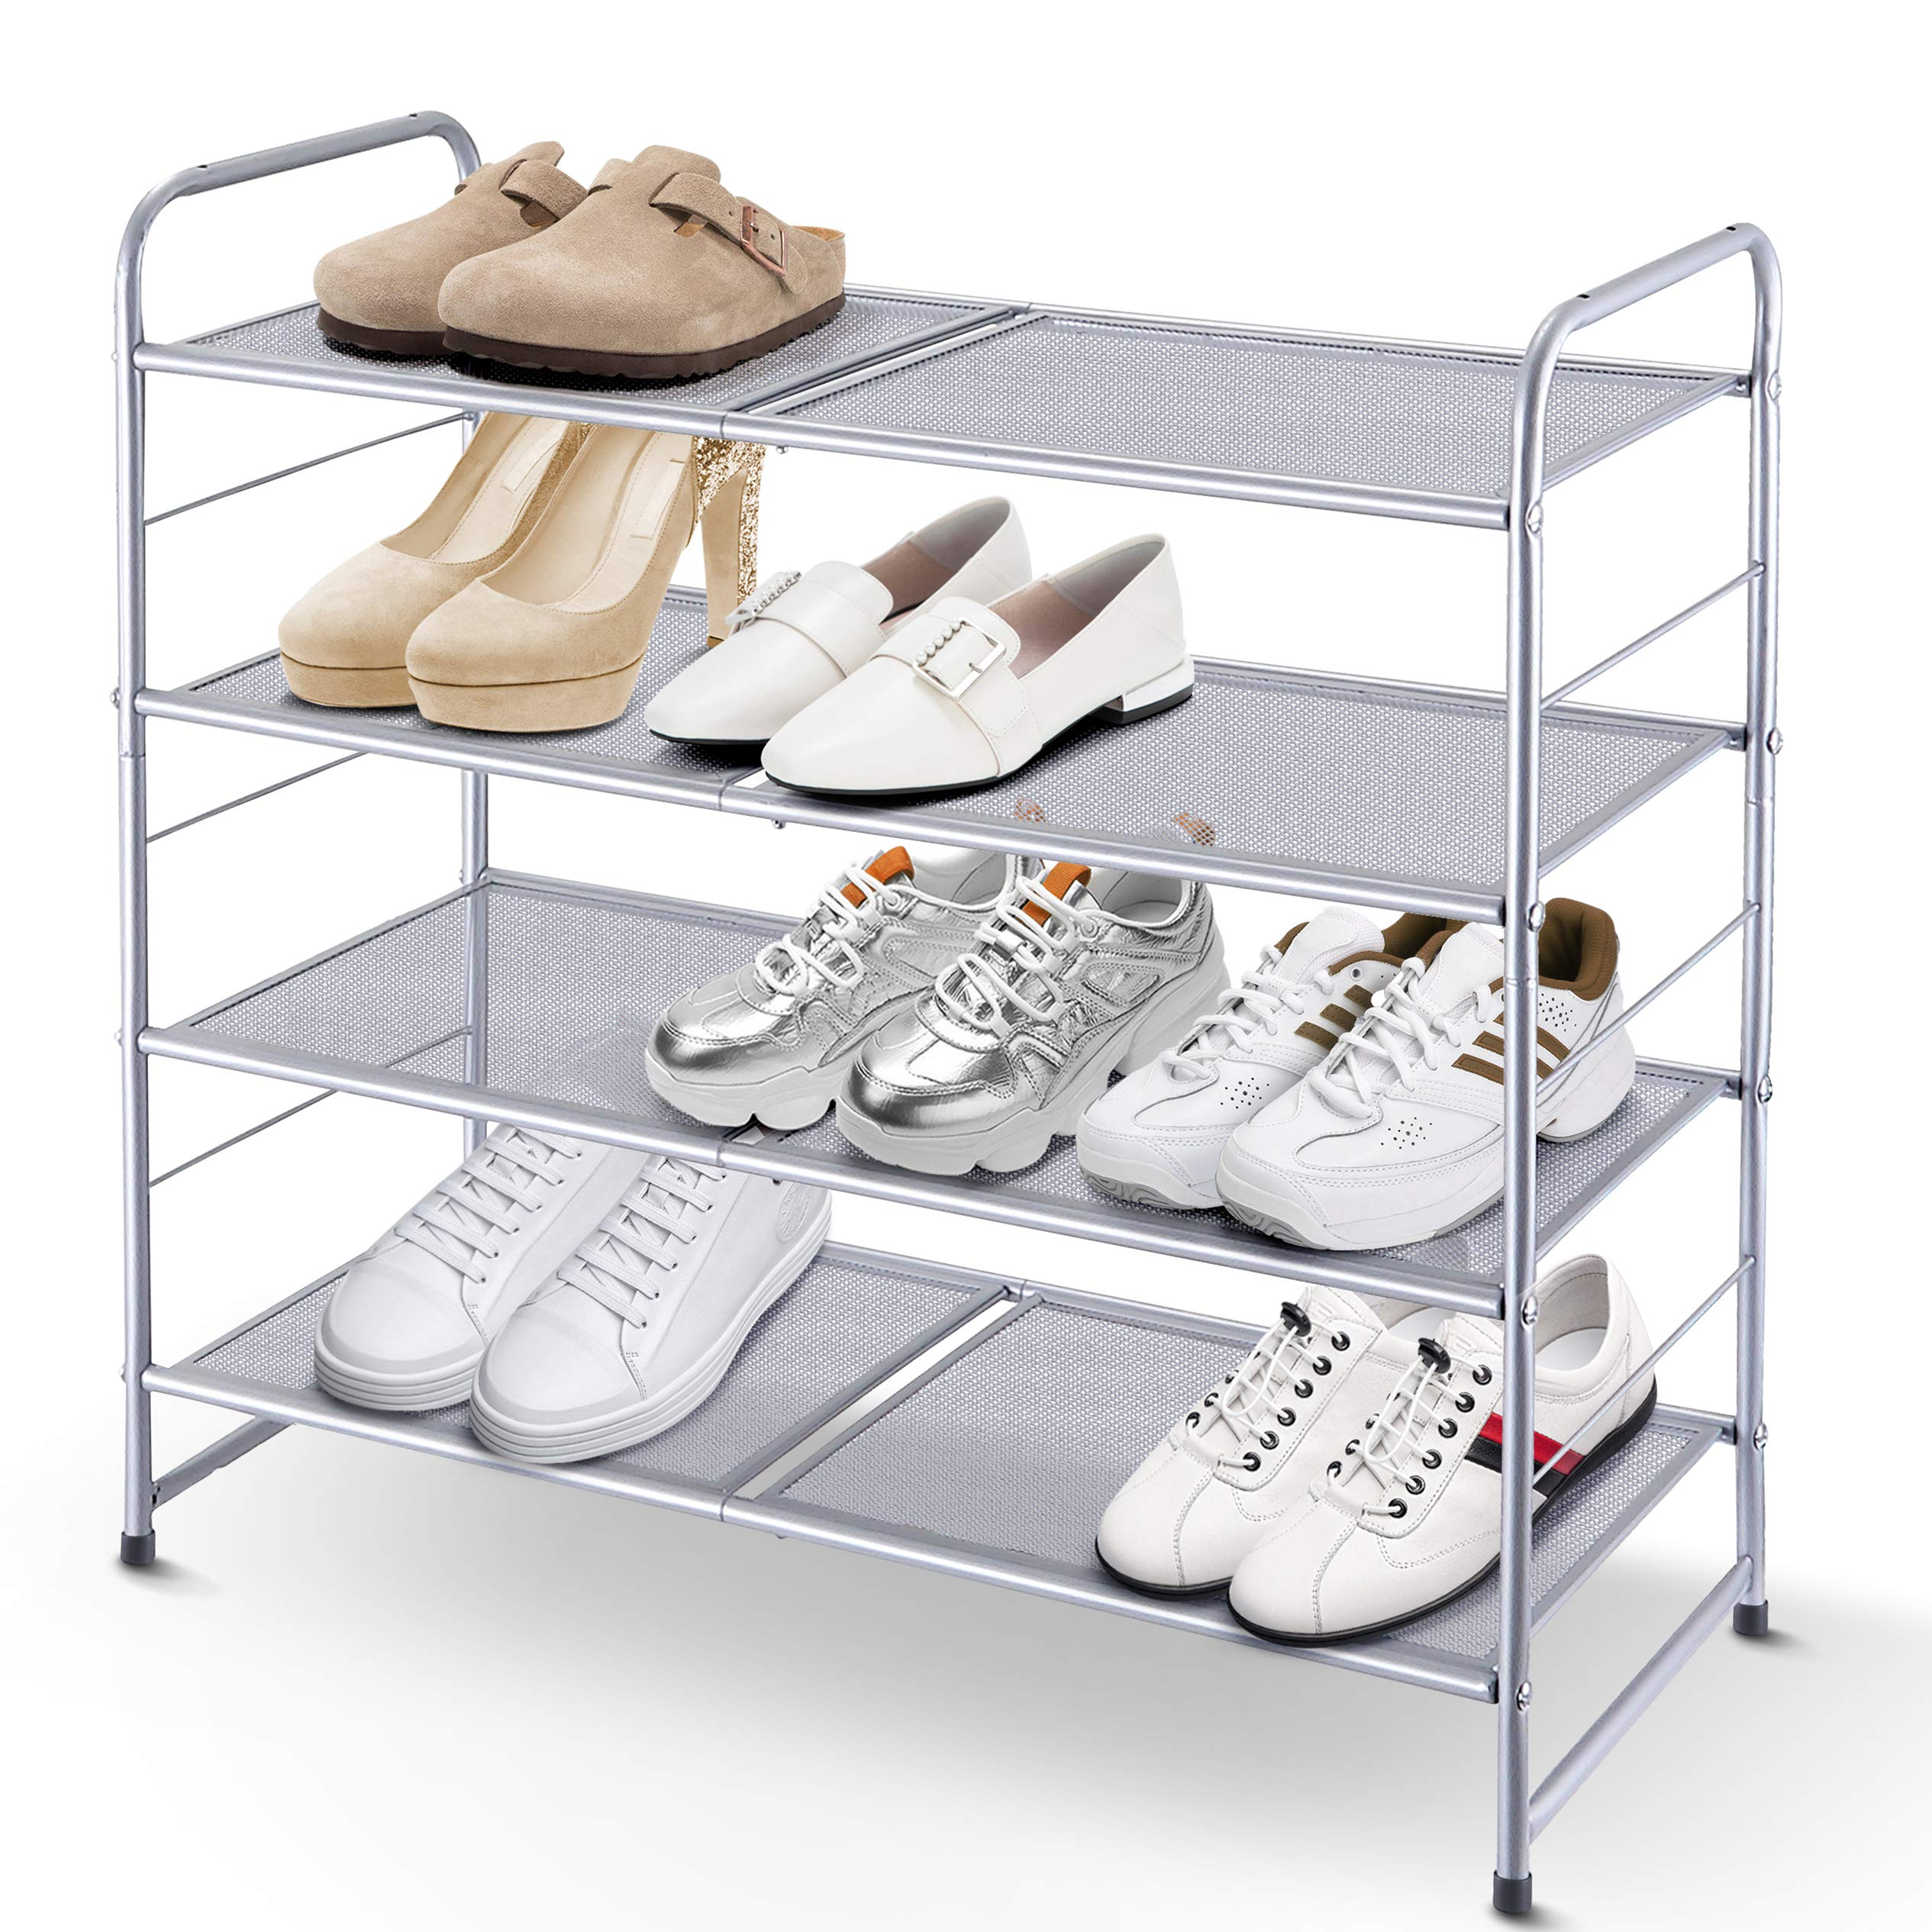 Simple Trending 4-Tier Stackable Shoe Rack, Expandable & Adjustable Shoe Shelf Storage Organizer, Metal Mesh, Silver by Simple Trending